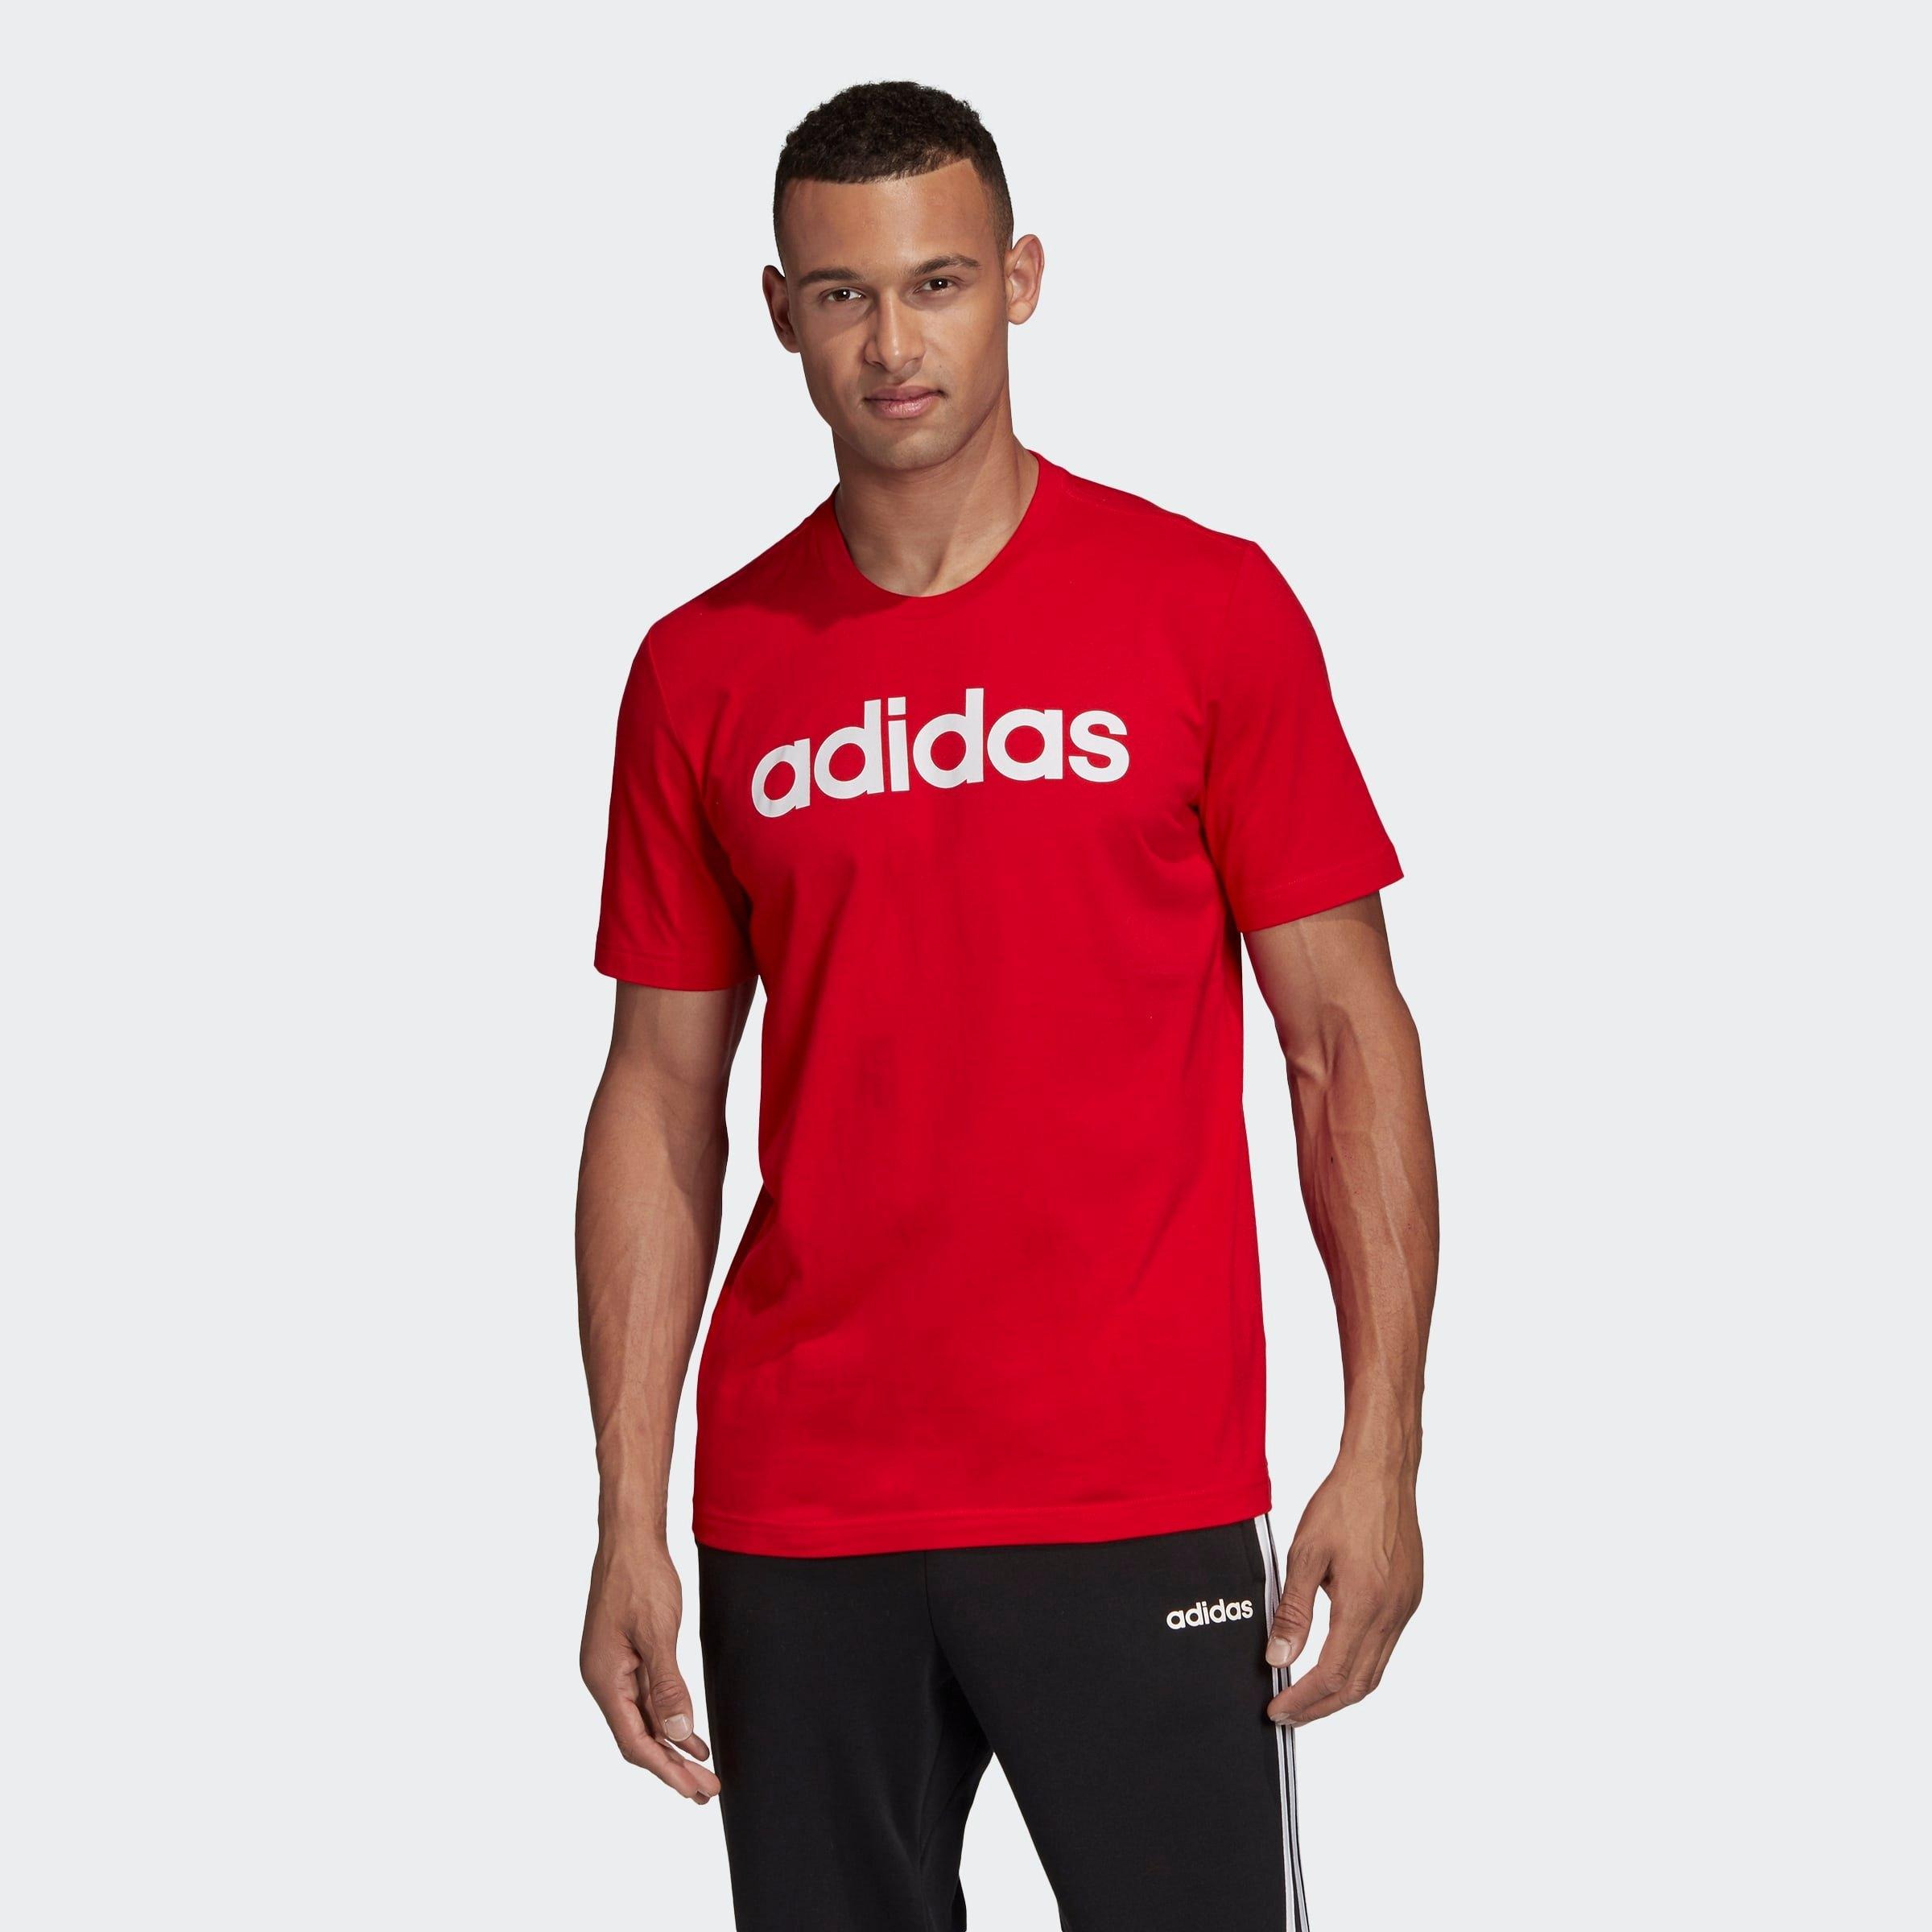 adidas T-shirt ESSENTIALS LINEAR LOGO nu online kopen bij OTTO